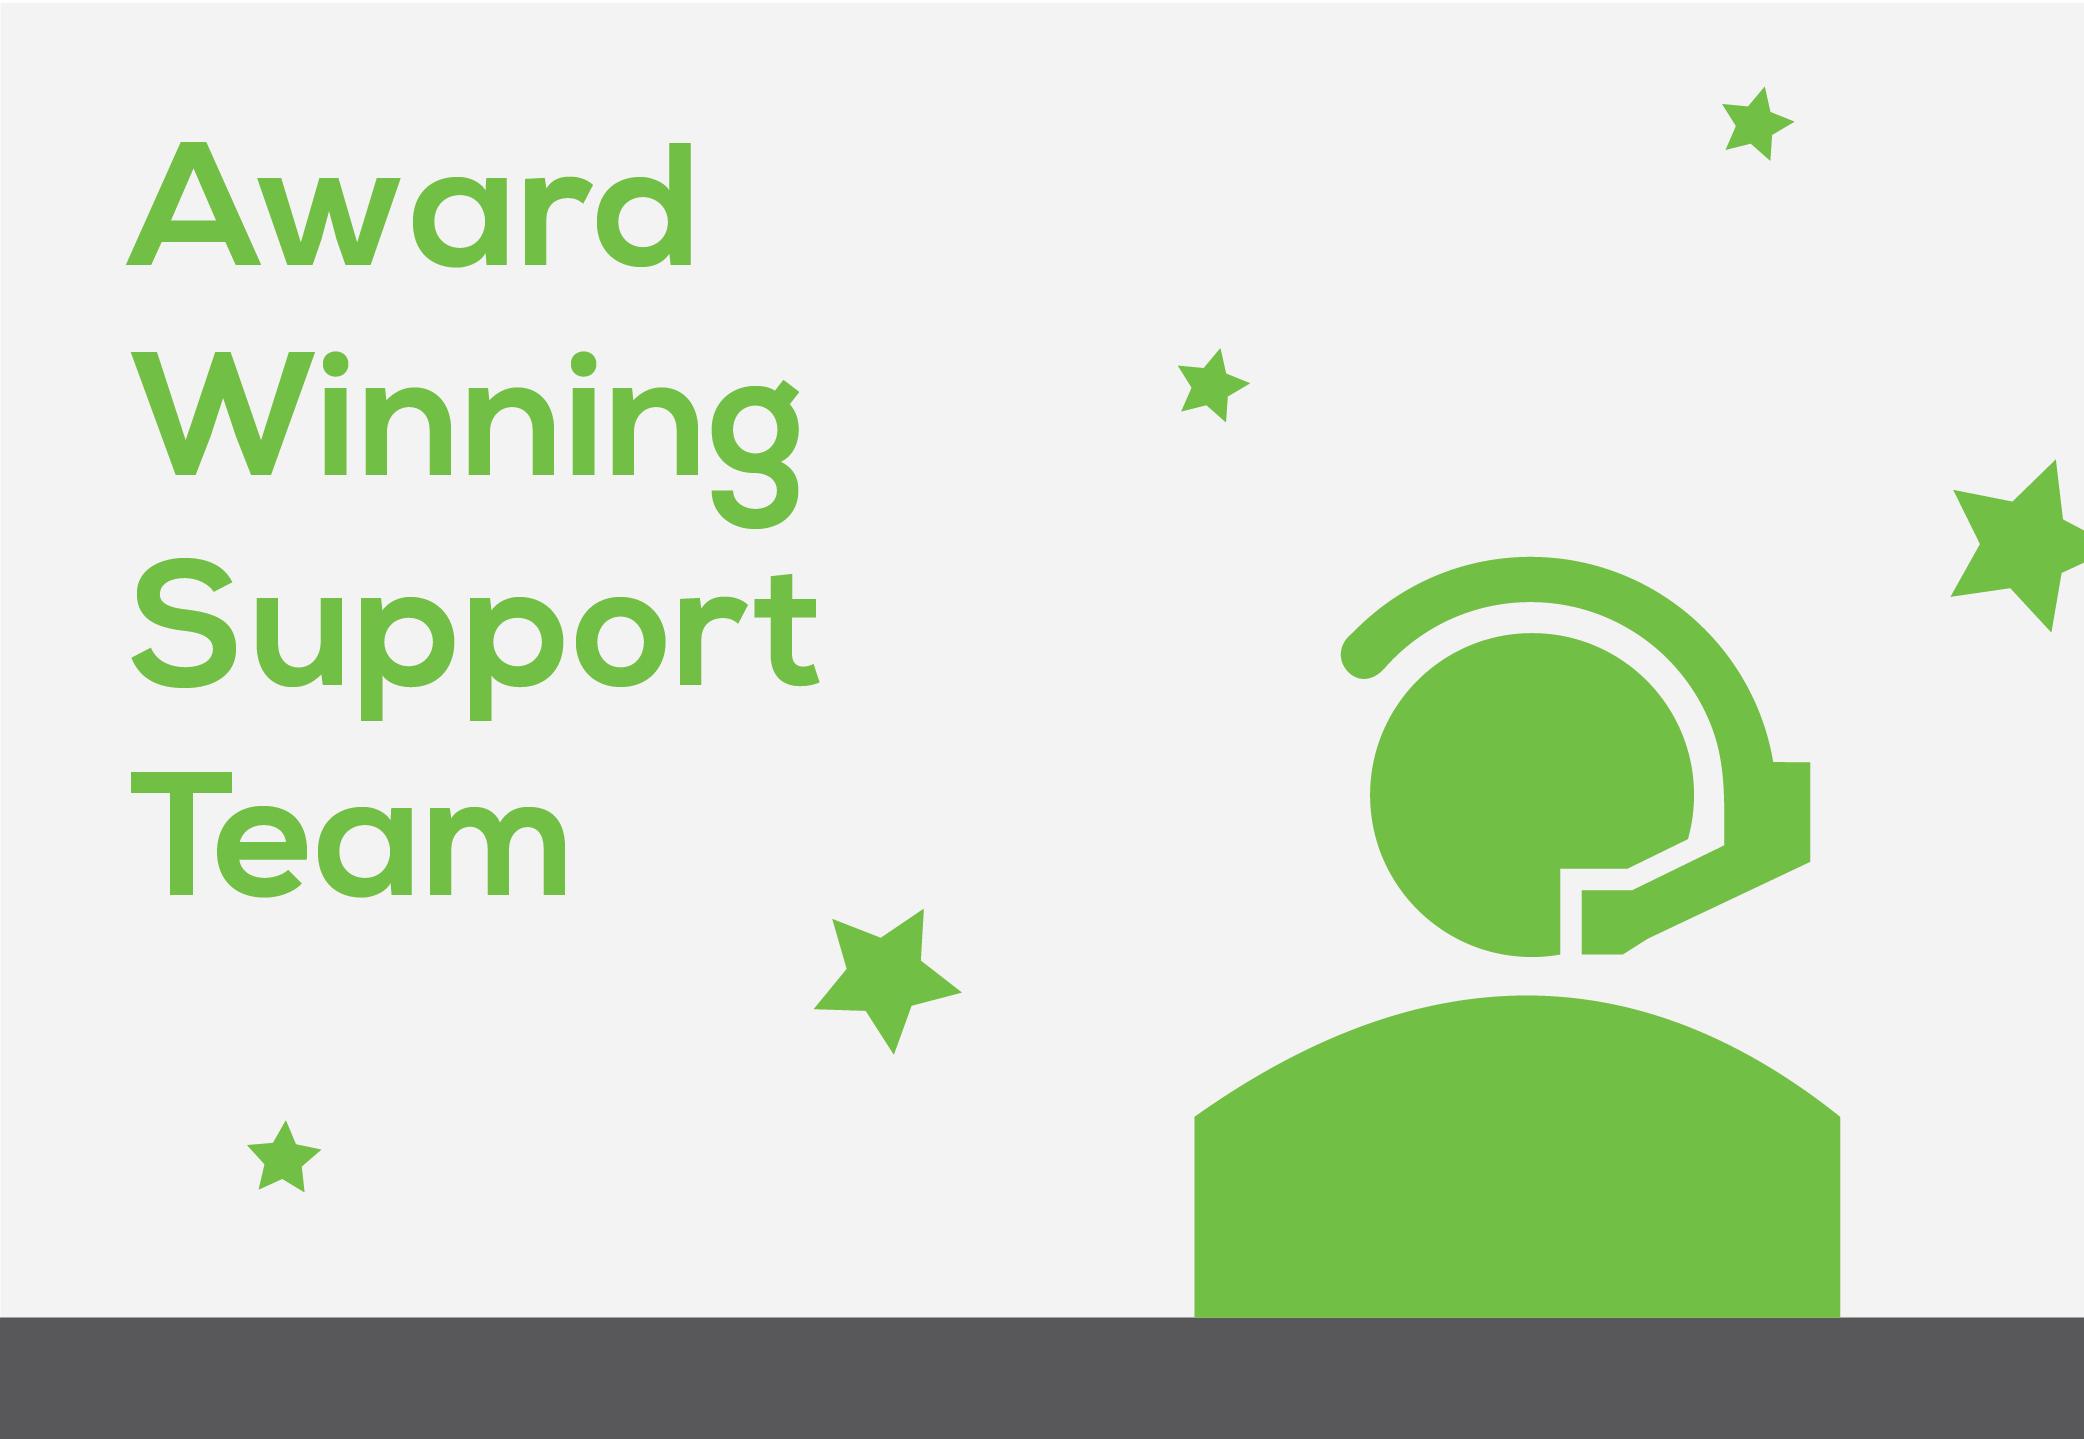 Award winning support team